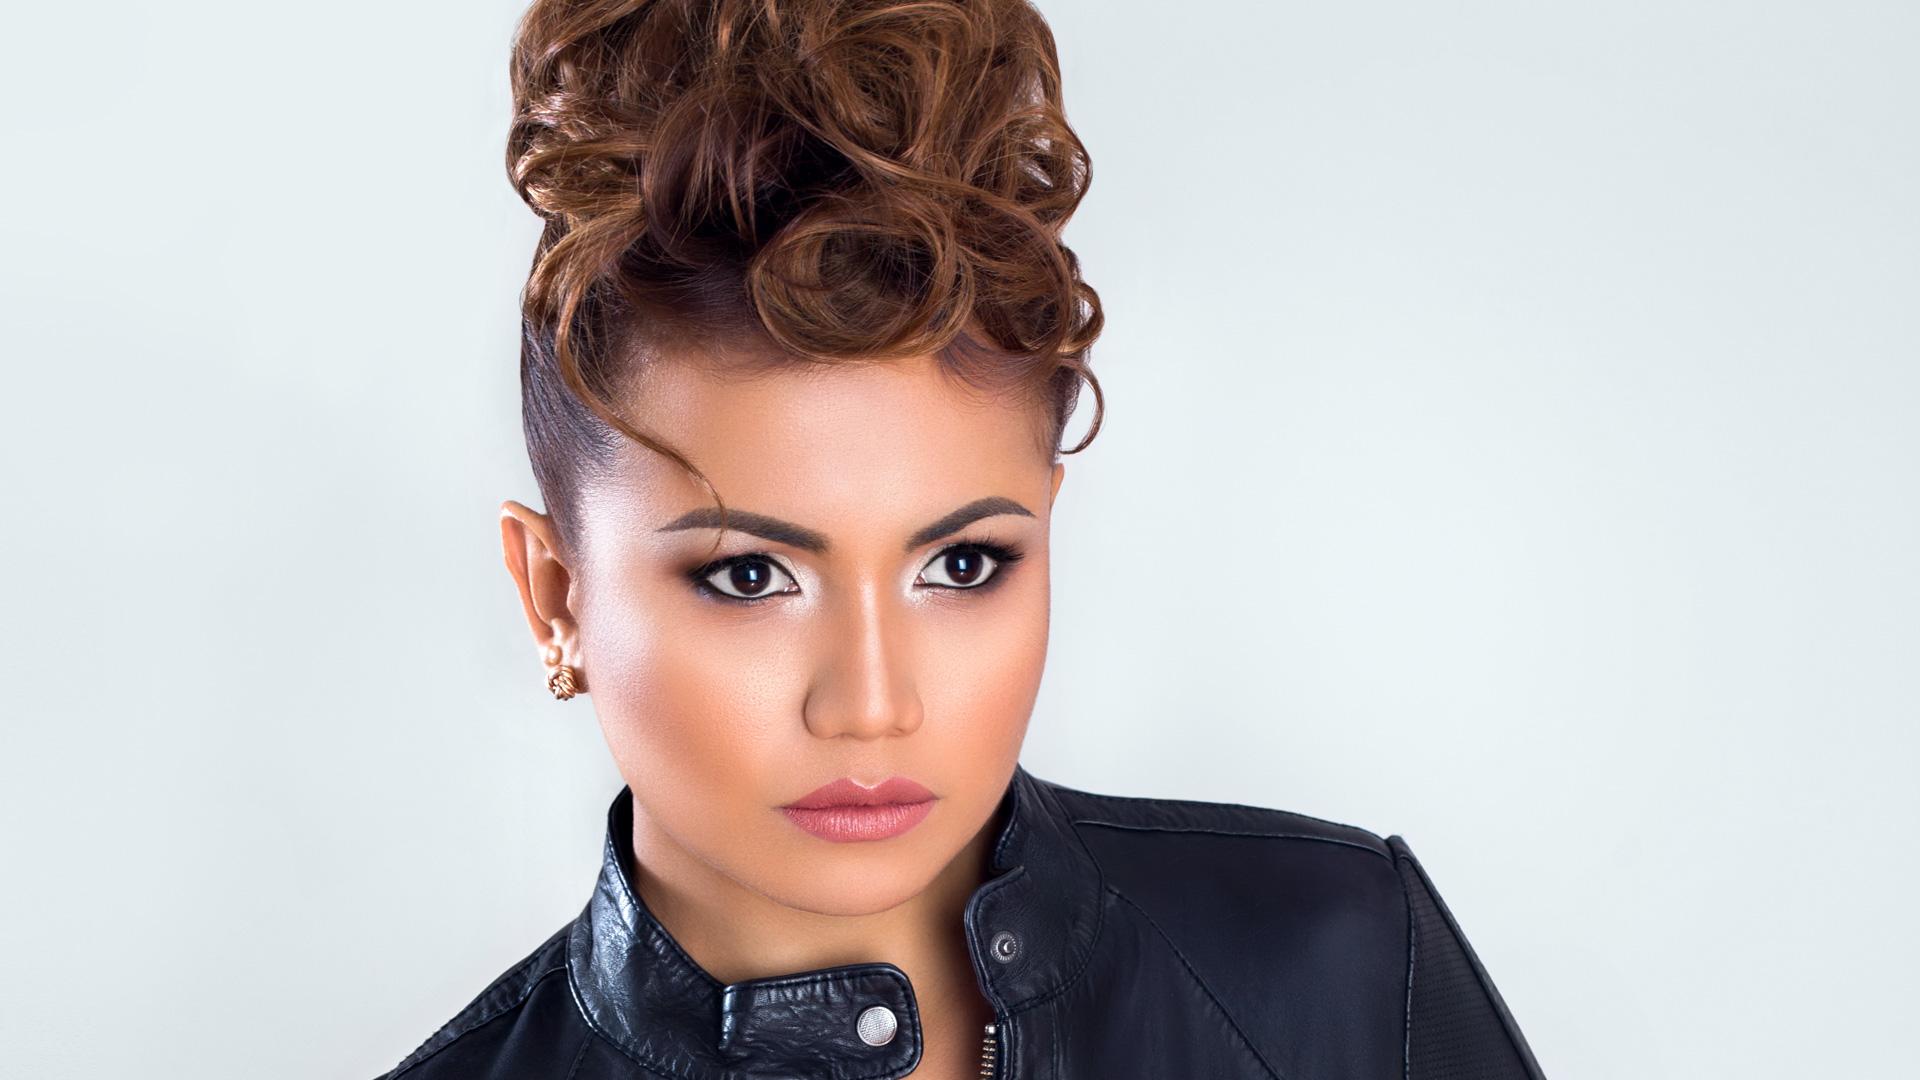 Headliners Unisex Salon Corp Bergenfield Nj Beauty Center Hair Salon Color Specialists